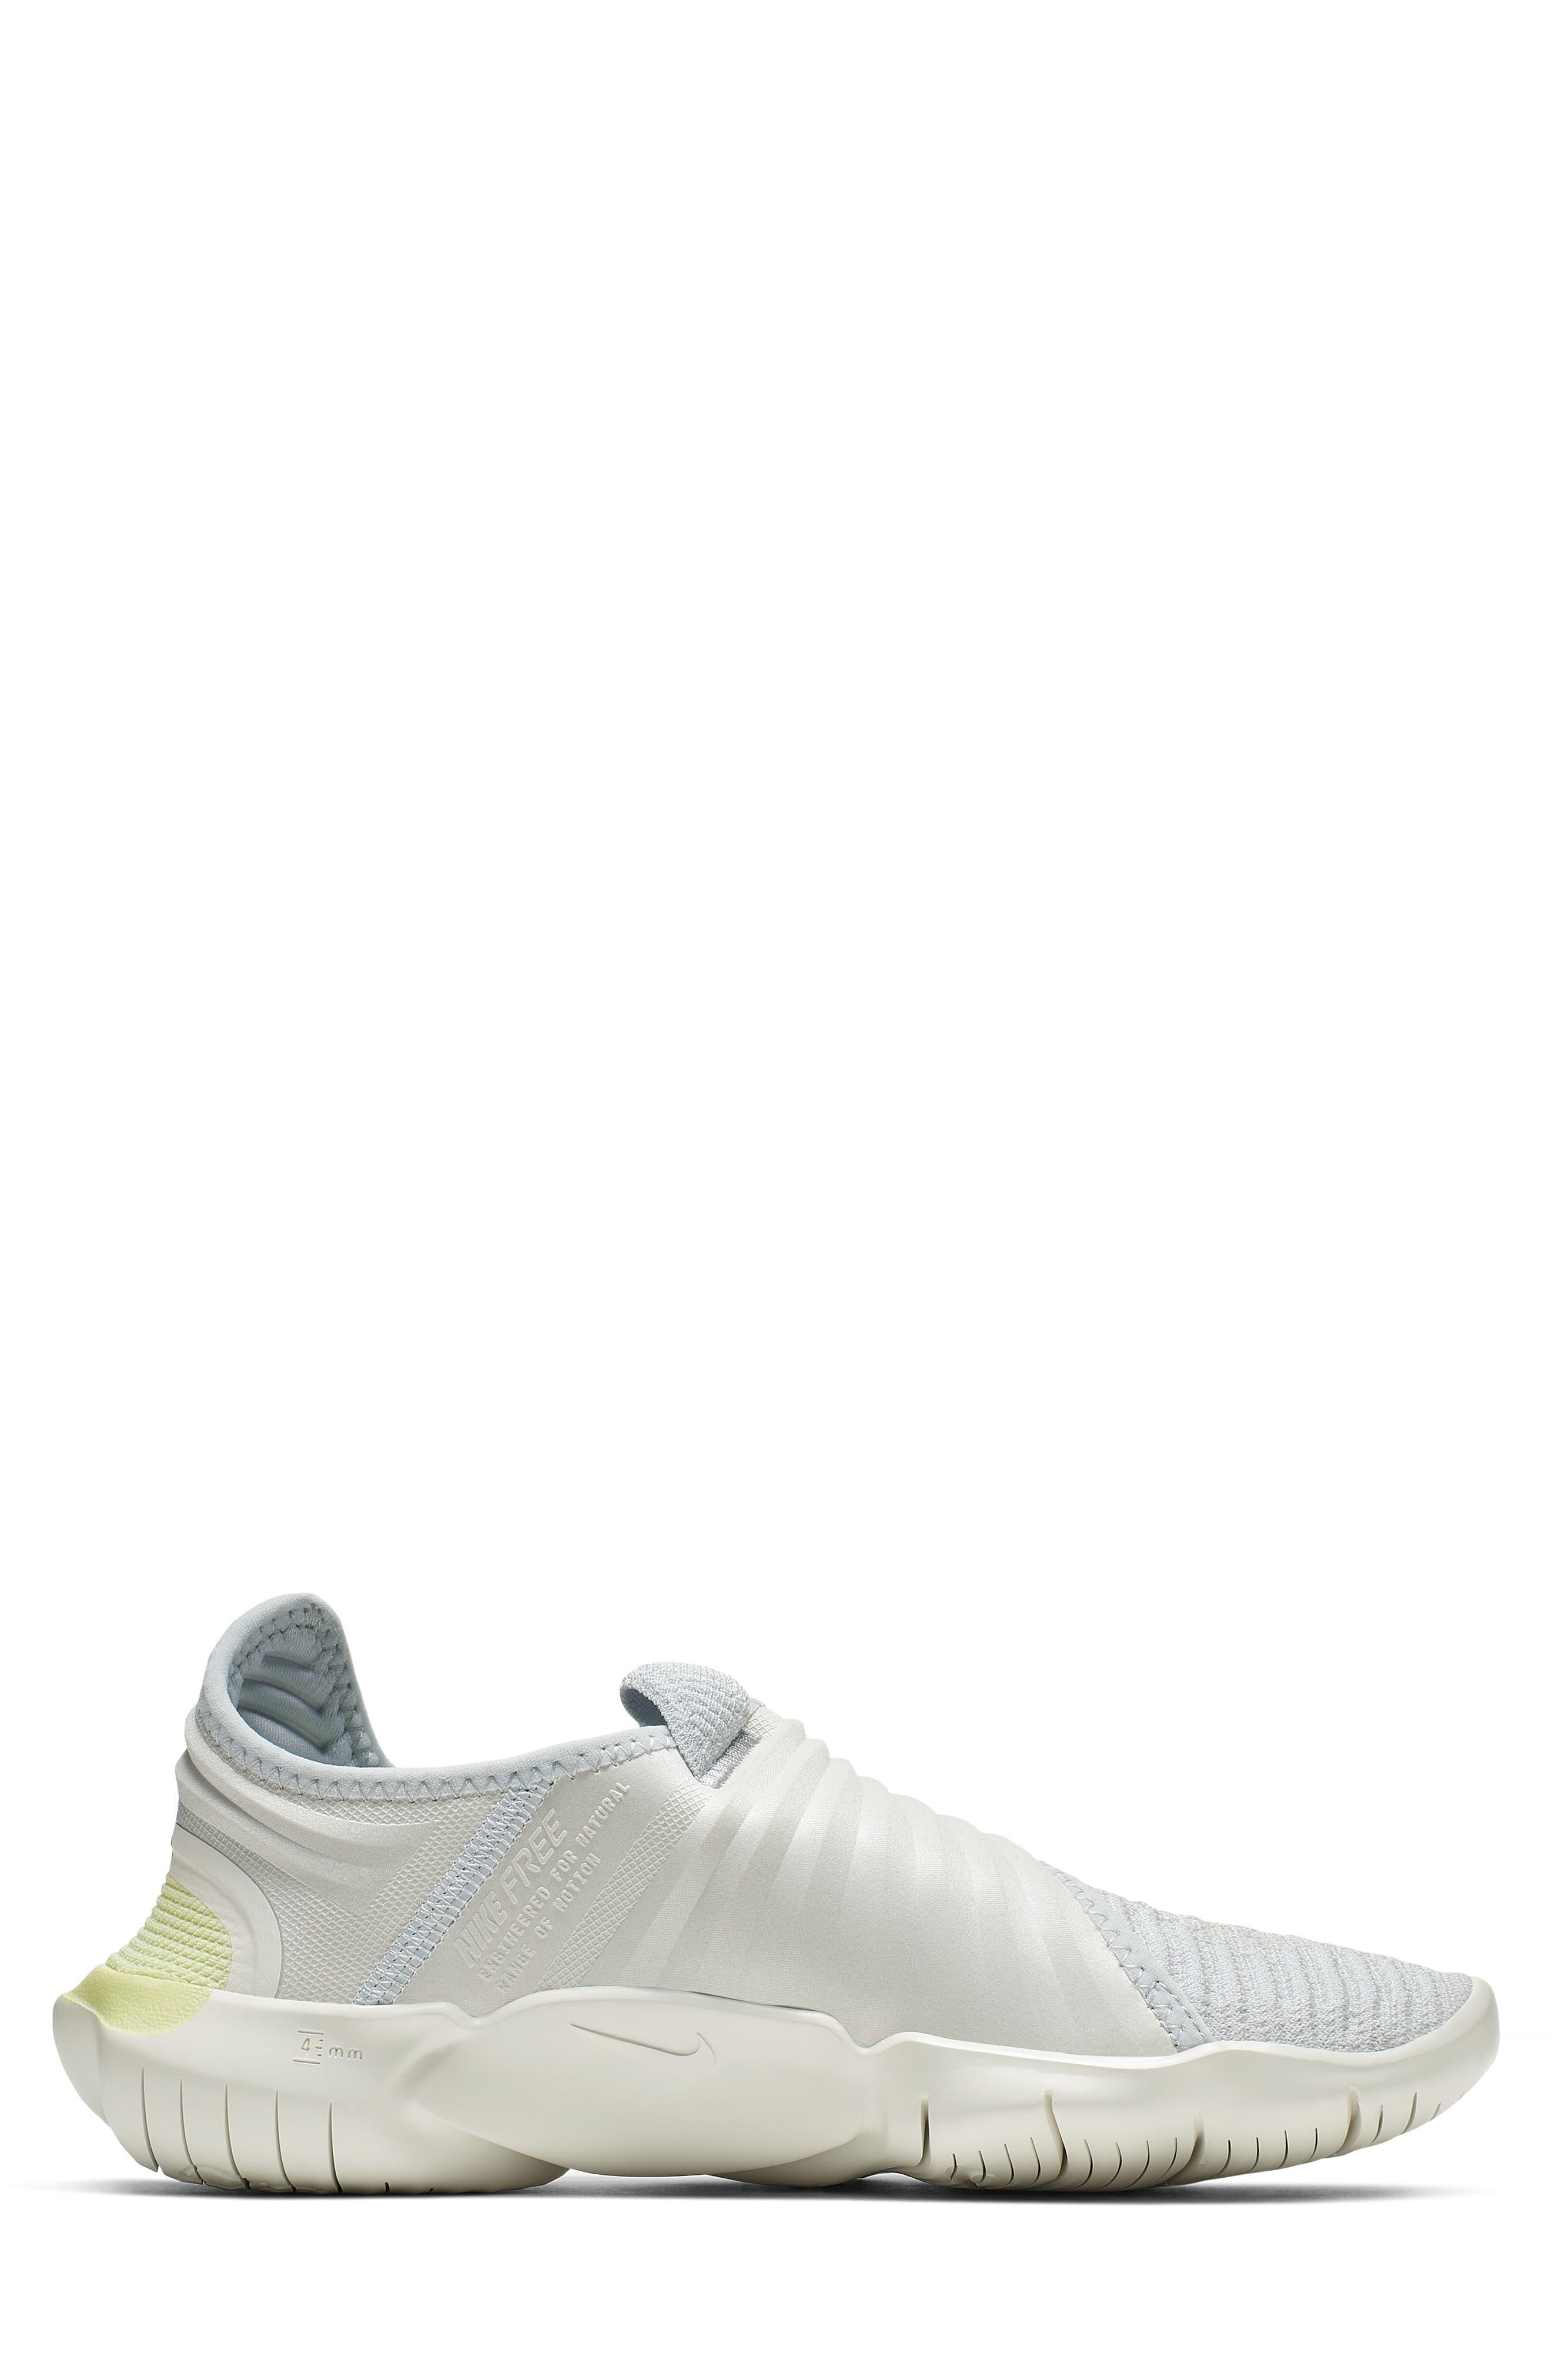 NIKE, Free RN Flyknit 3.0 Running Shoe, Alternate thumbnail 3, color, PURE PLATINUM/ BLACK/ GREEN